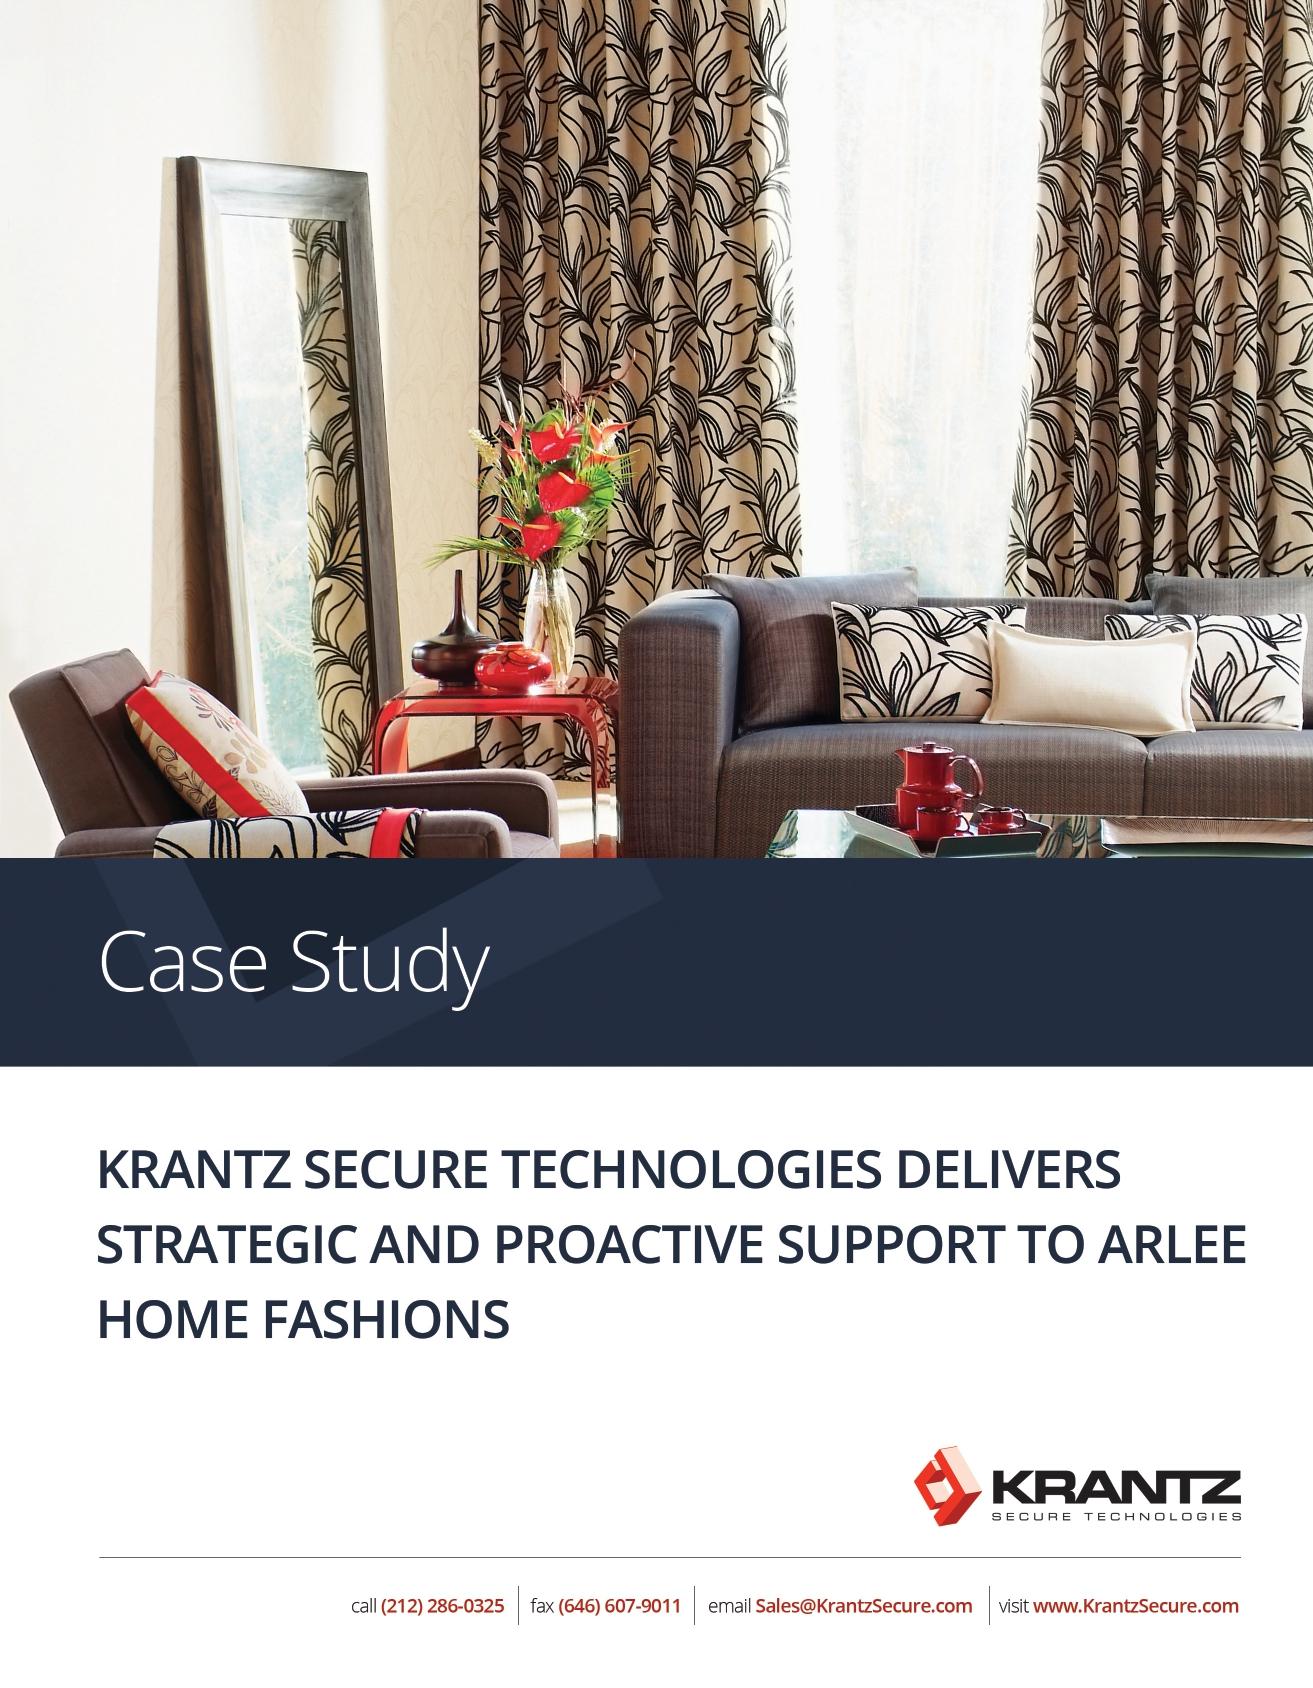 Krantz-Case-Study-Arlee-Home-Fashions_page-0001